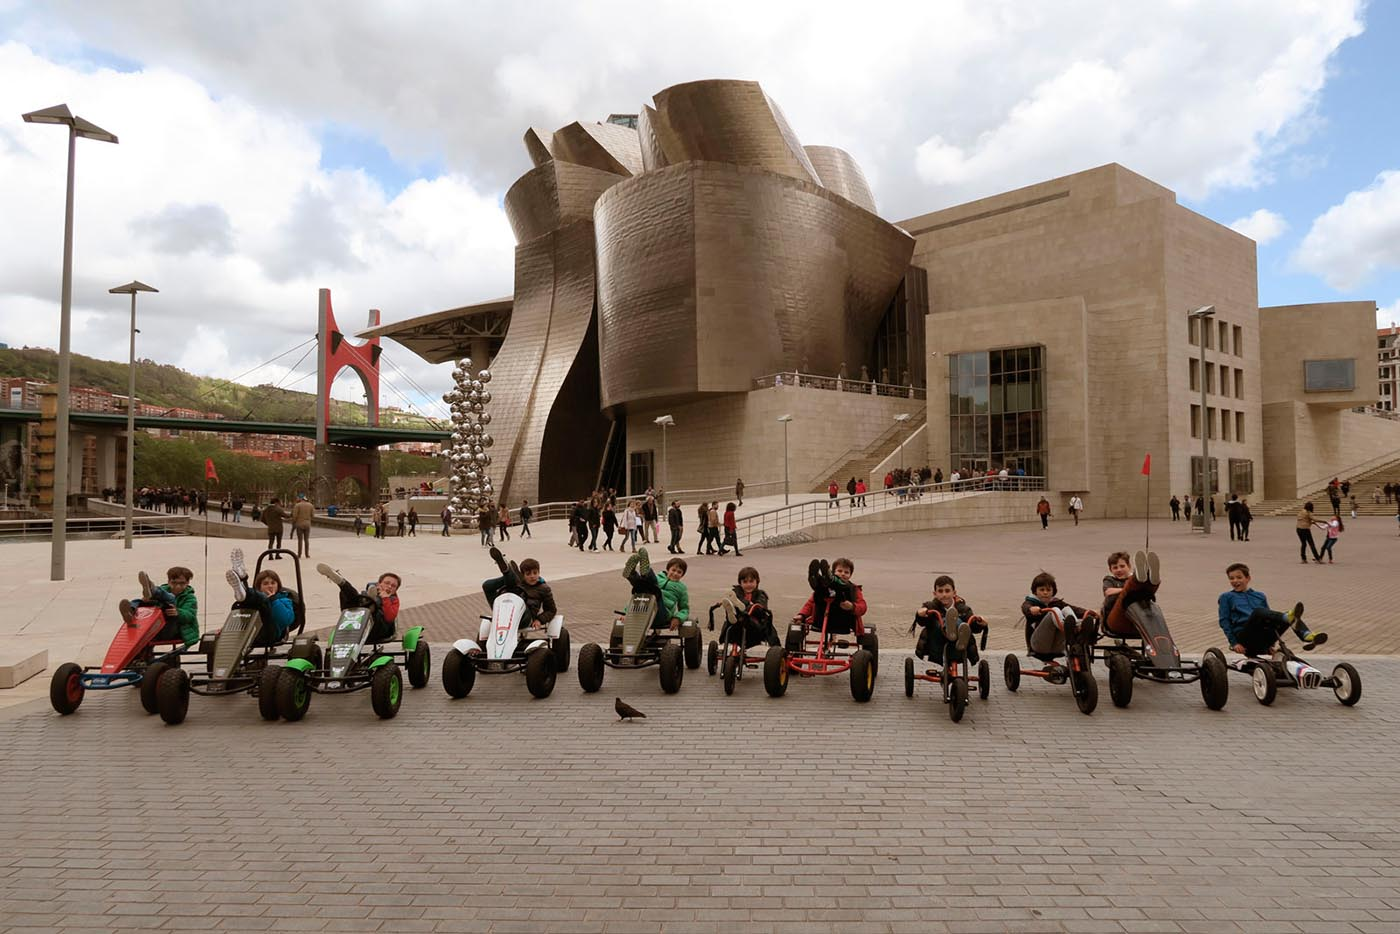 BilbaoXperience